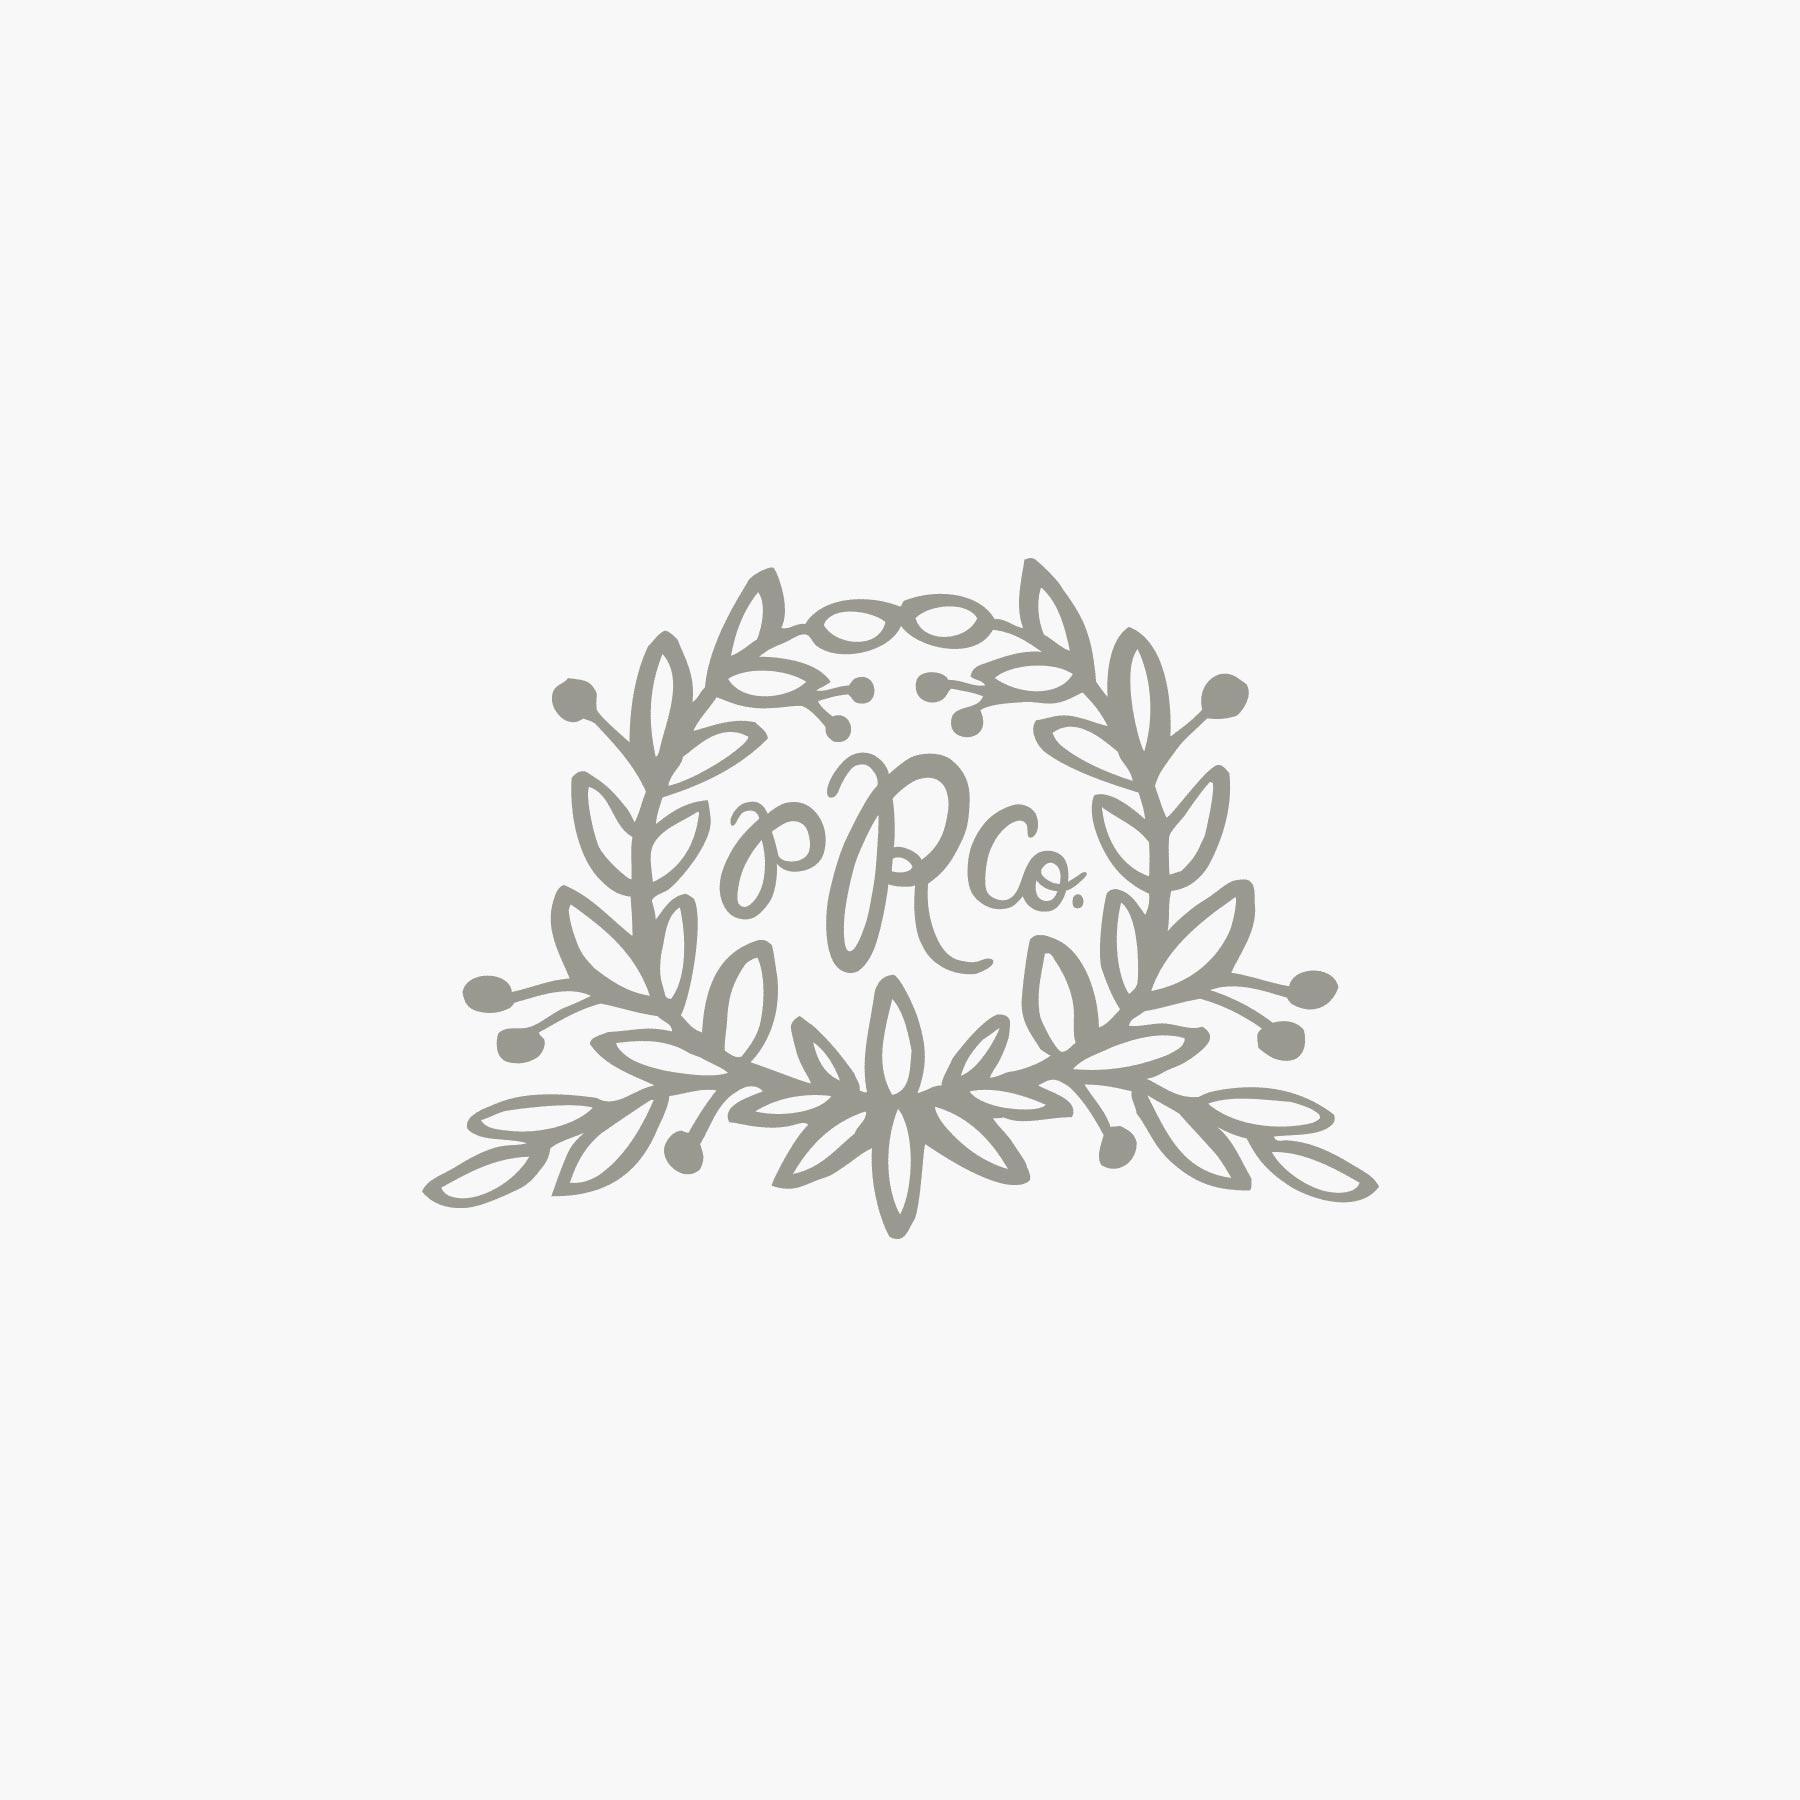 Motif Personalized Flat Notes- Botanical Raspberry